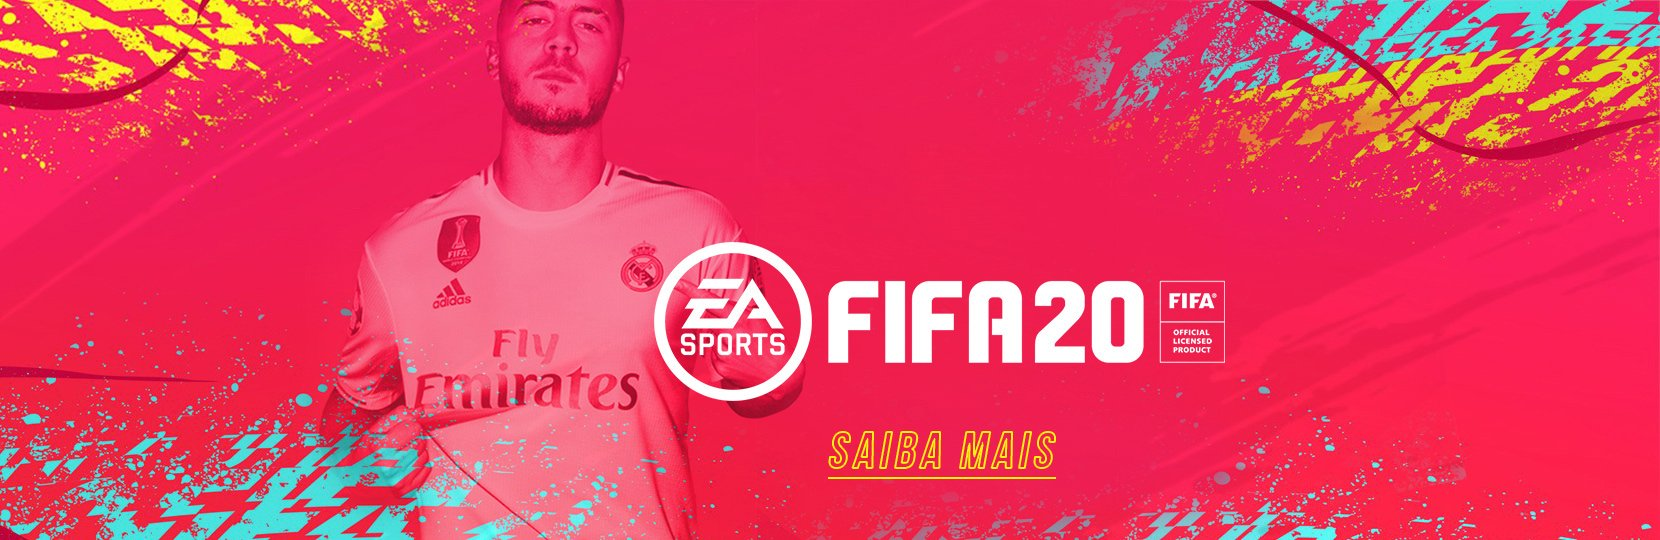 FIFA 20 pronta entrega